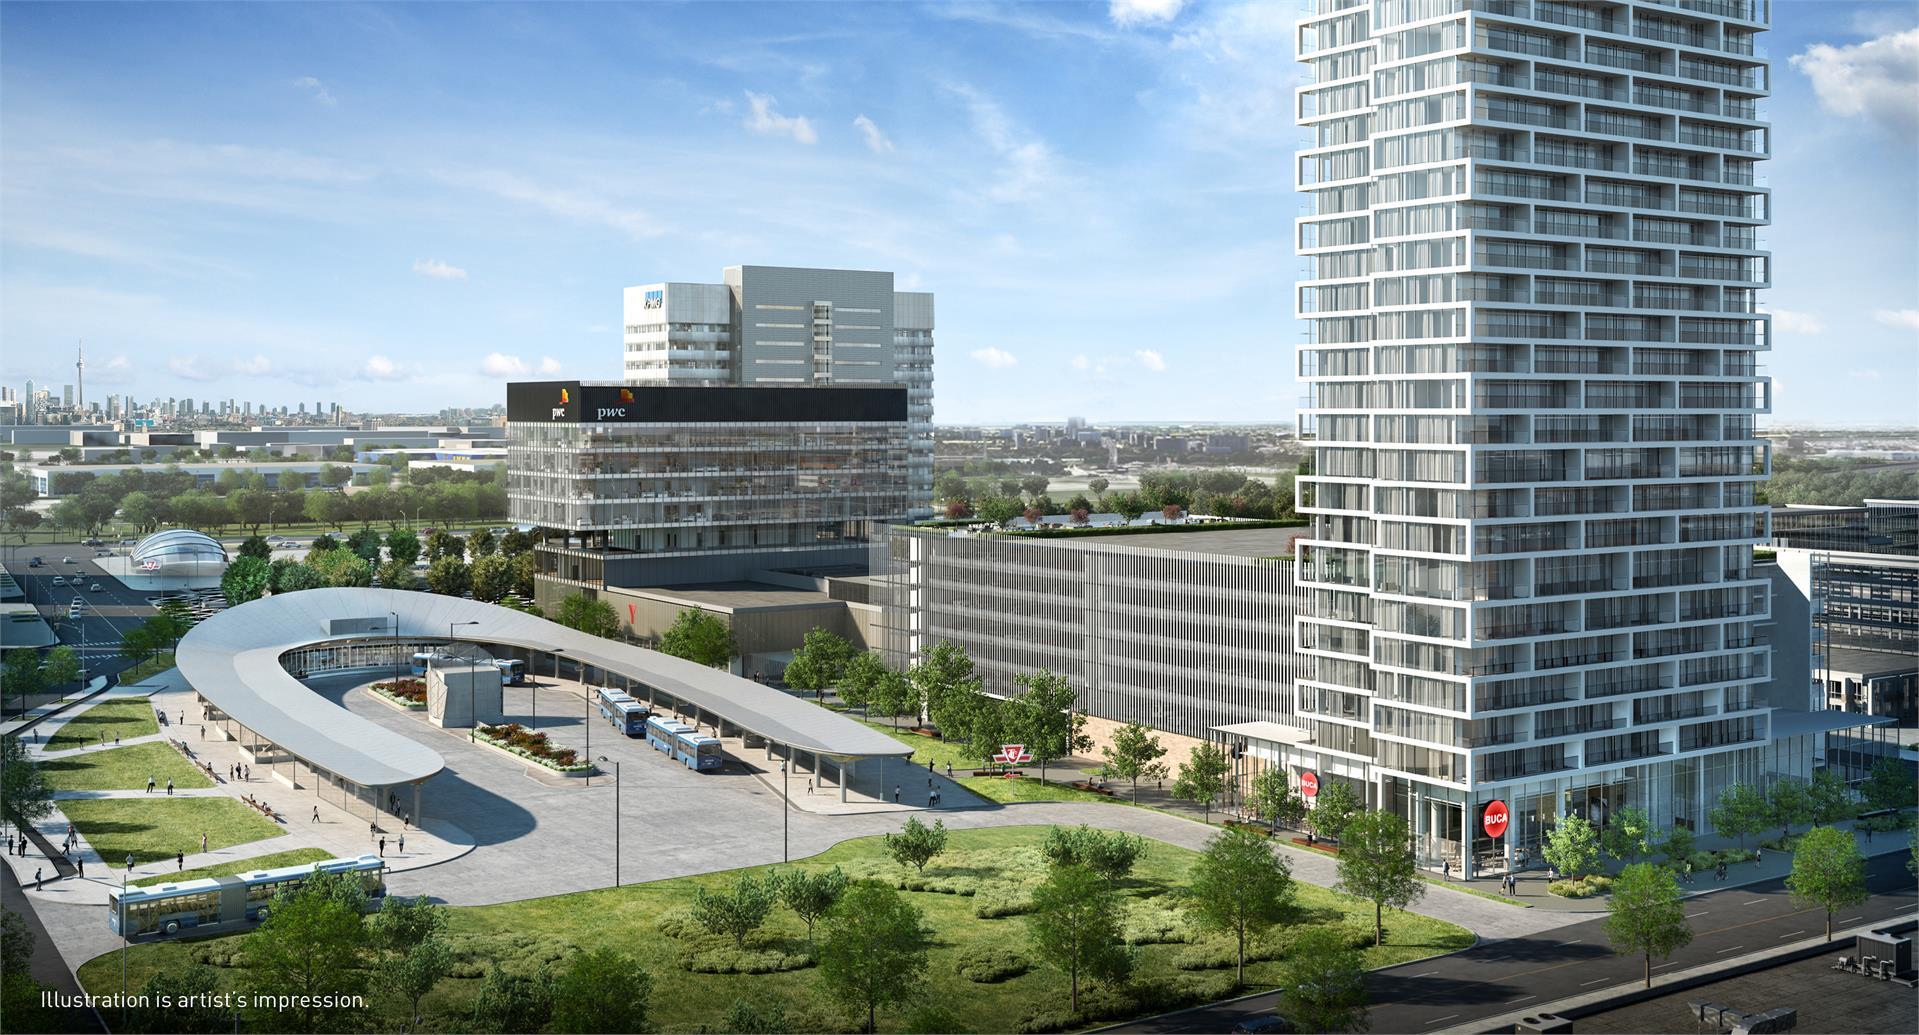 Transit City Condos in Vaughan